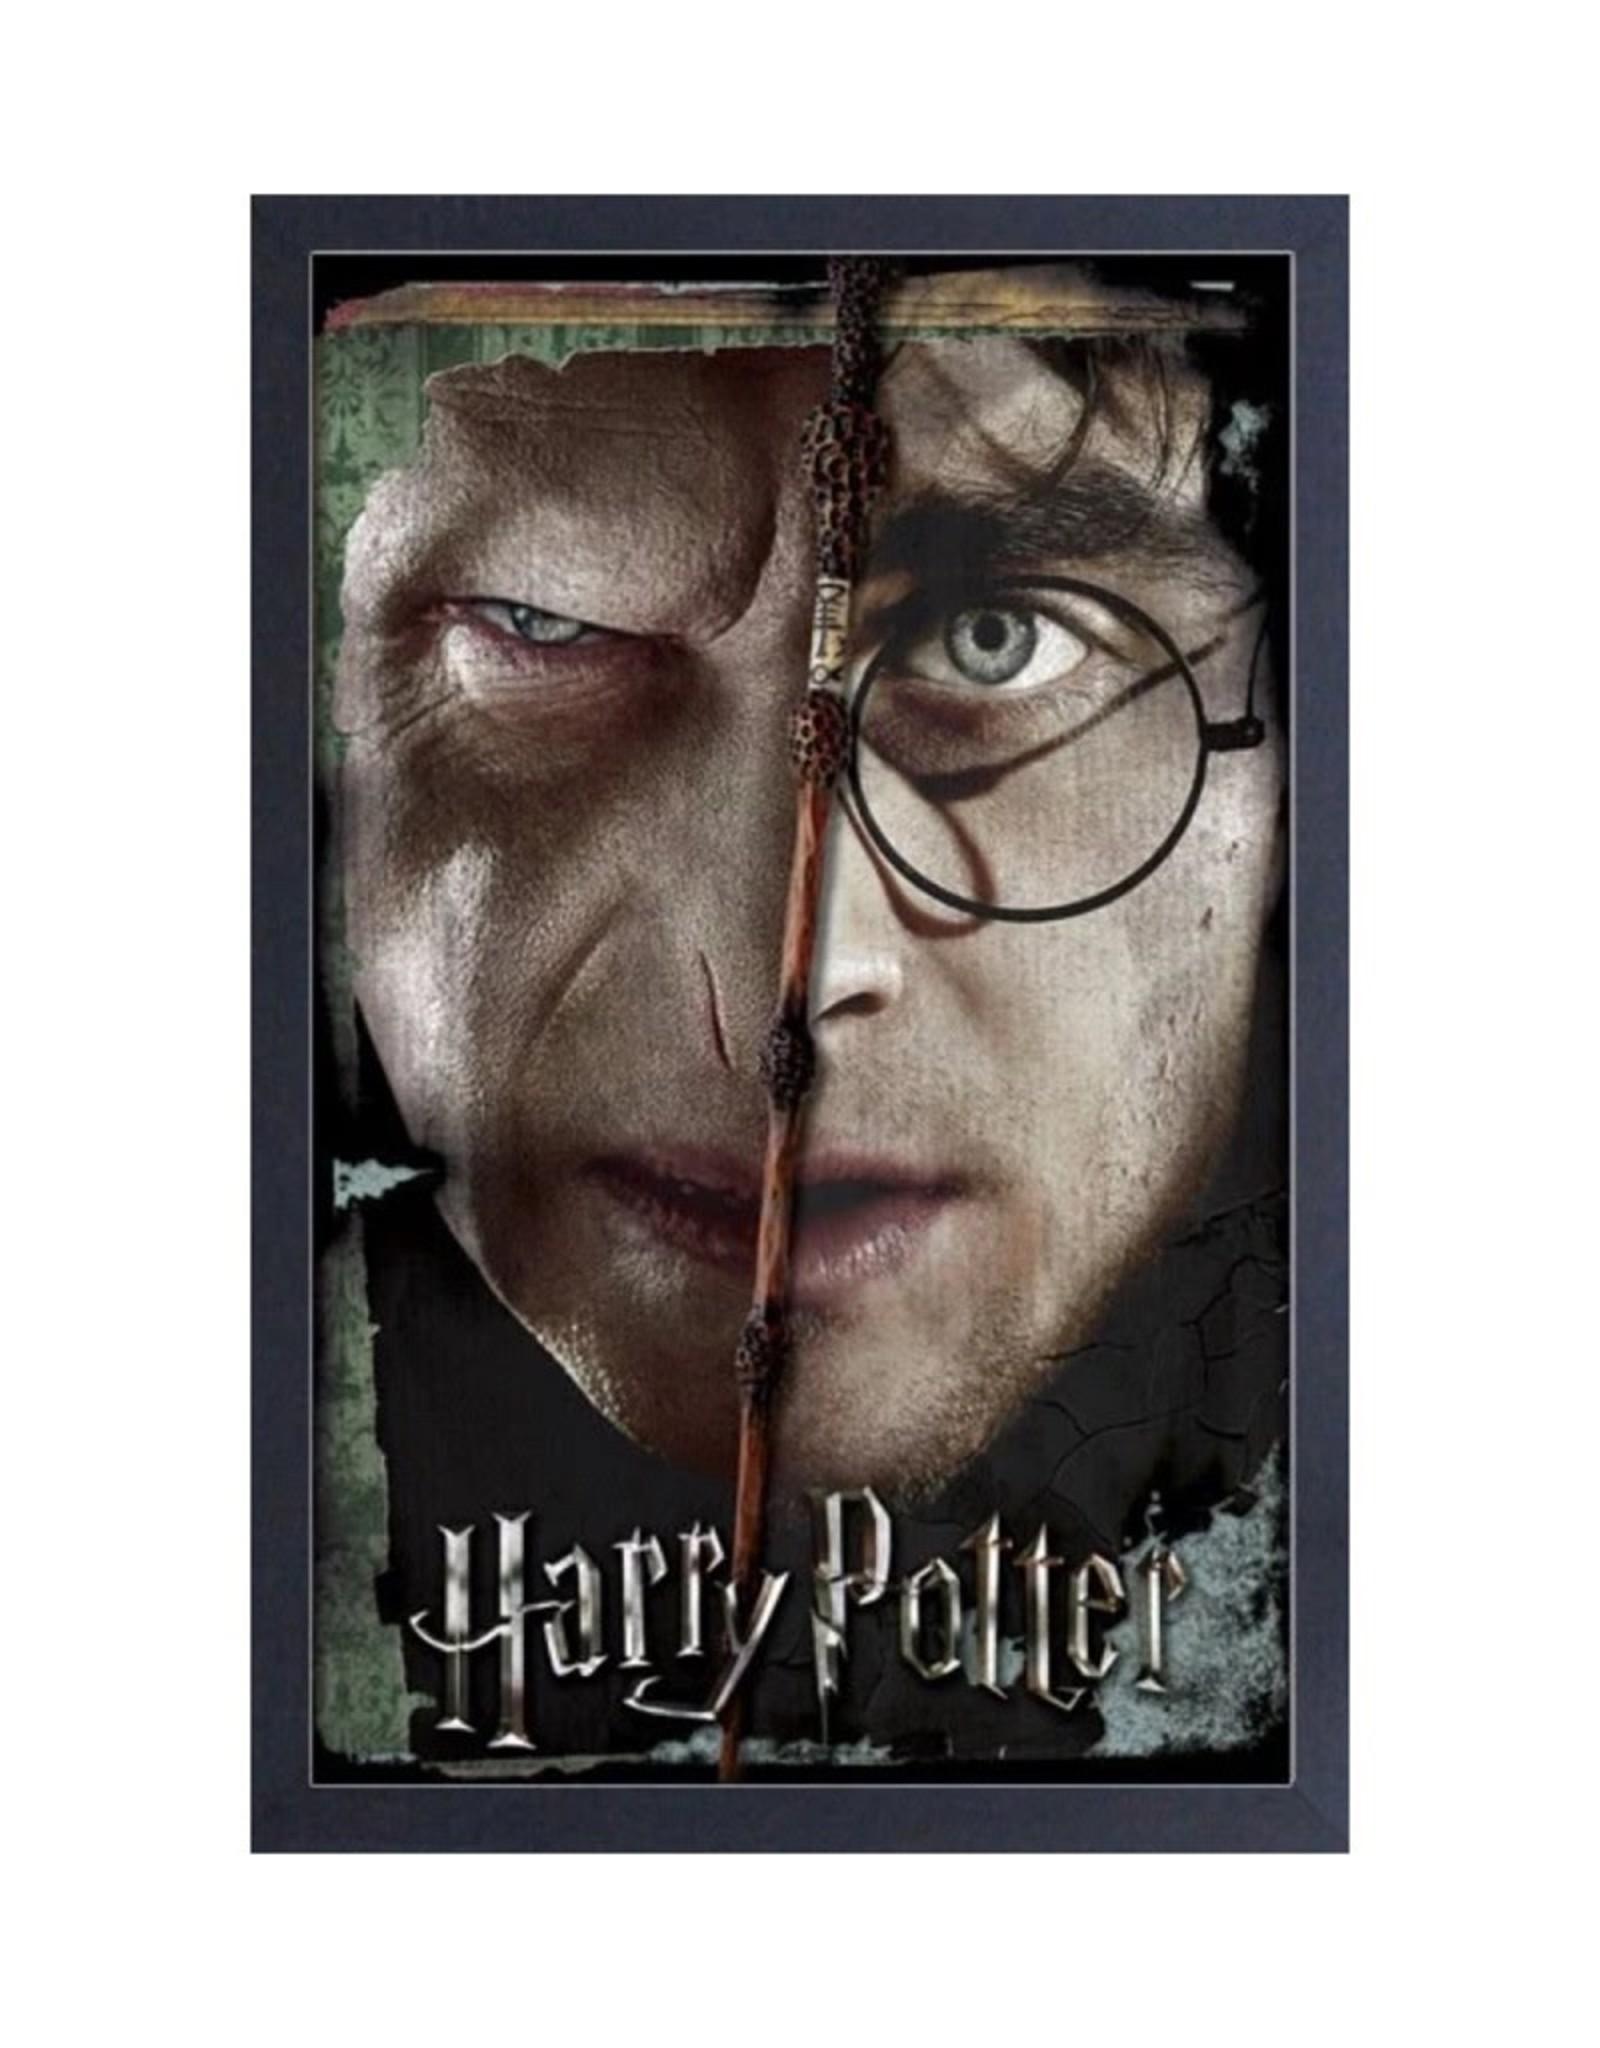 Harry Potter Harry Potter ( Framed print ) Split Face